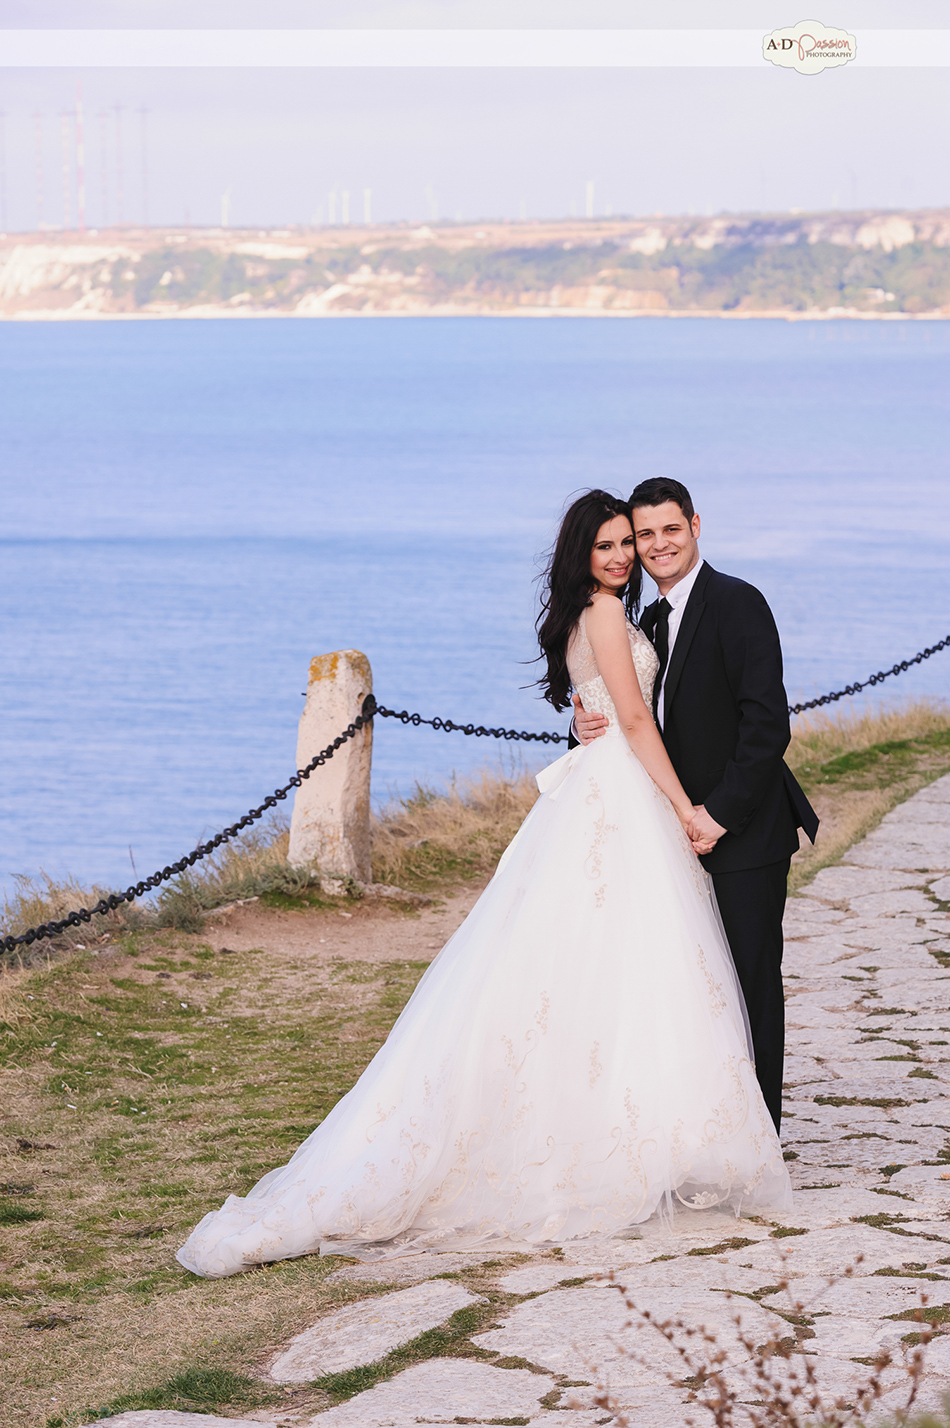 AD Passion Photography | 20131008_fotograf-nunta-profesionist_after-wedding-balchik_razvan-si-eliza_0023 | Adelin, Dida, fotograf profesionist, fotograf de nunta, fotografie de nunta, fotograf Timisoara, fotograf Craiova, fotograf Bucuresti, fotograf Arad, nunta Timisoara, nunta Arad, nunta Bucuresti, nunta Craiova